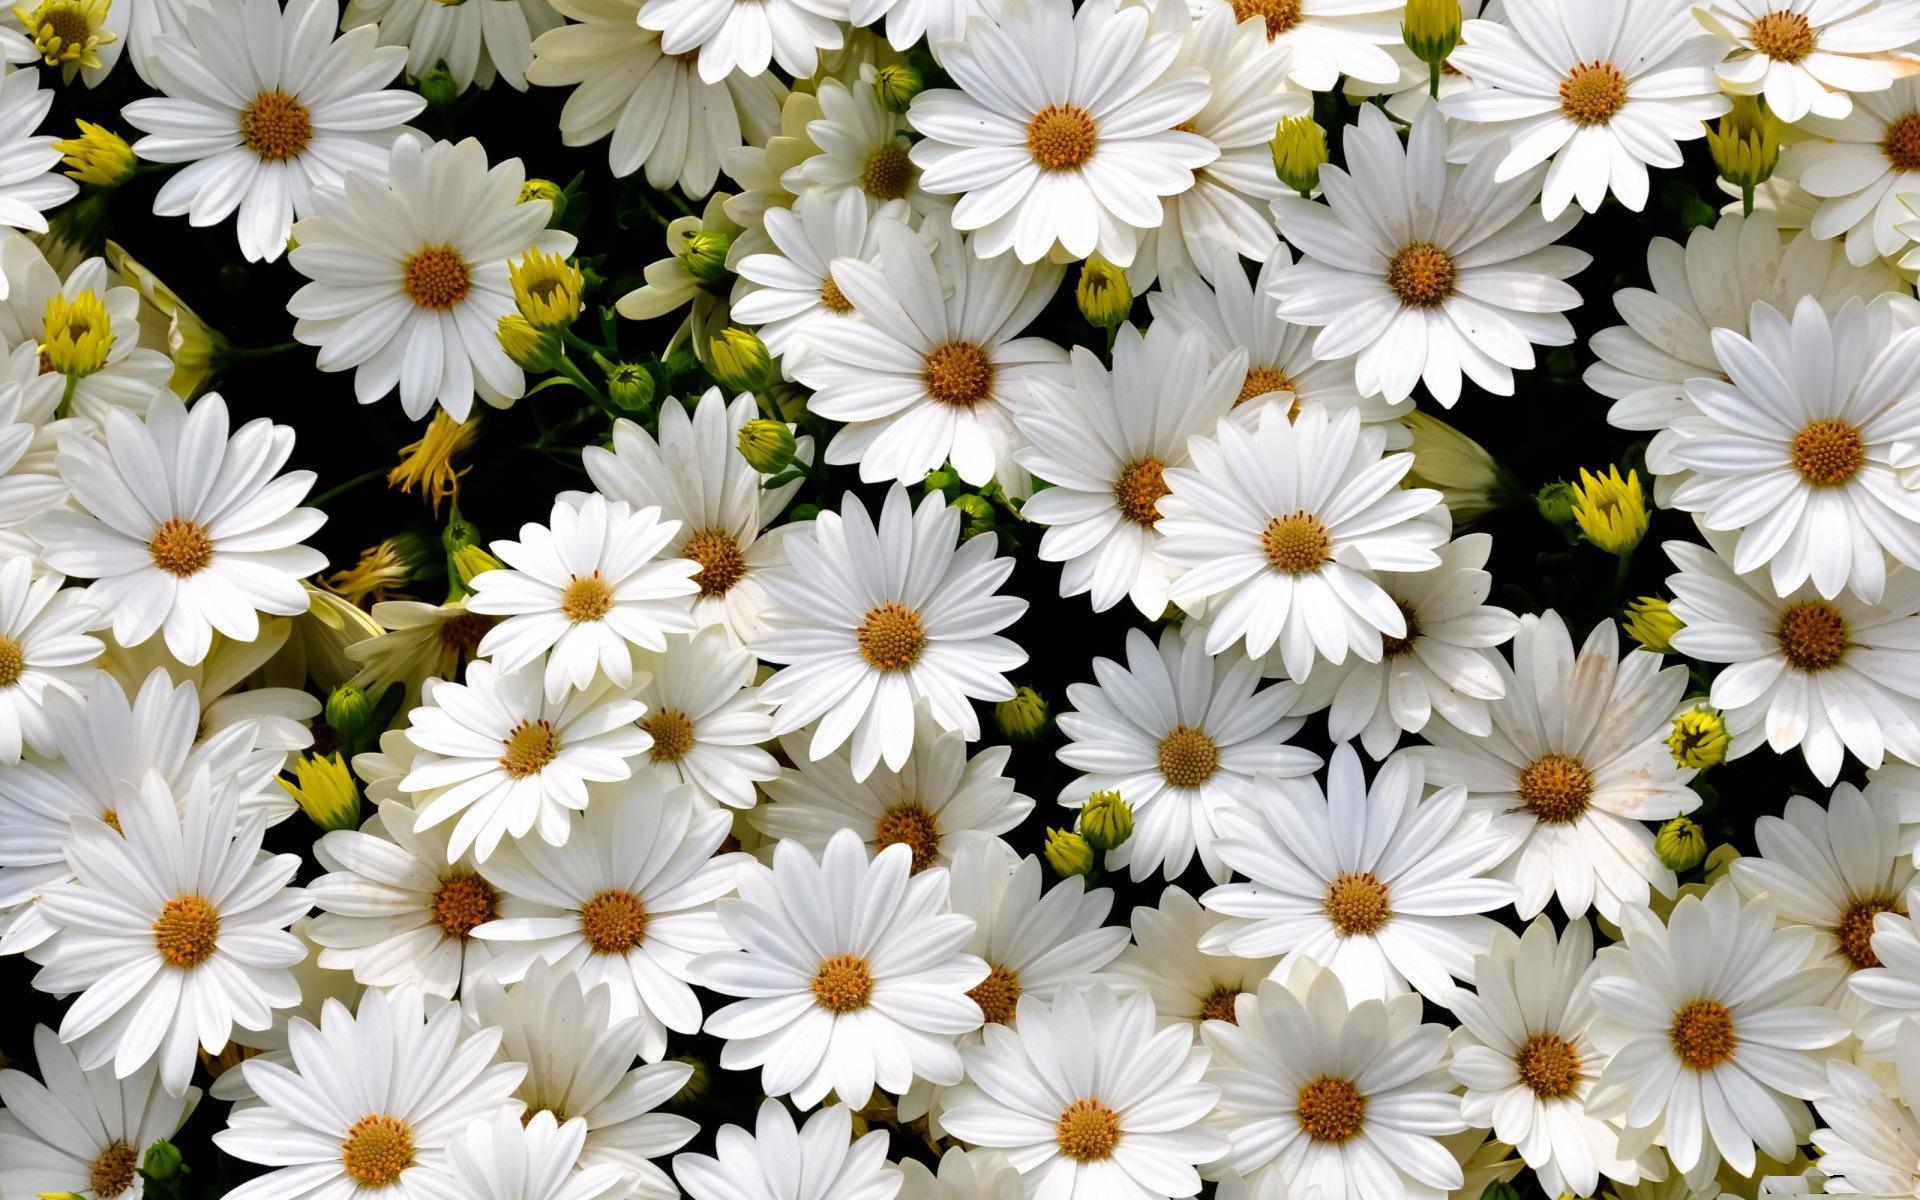 White daisies HQ Wallpaper